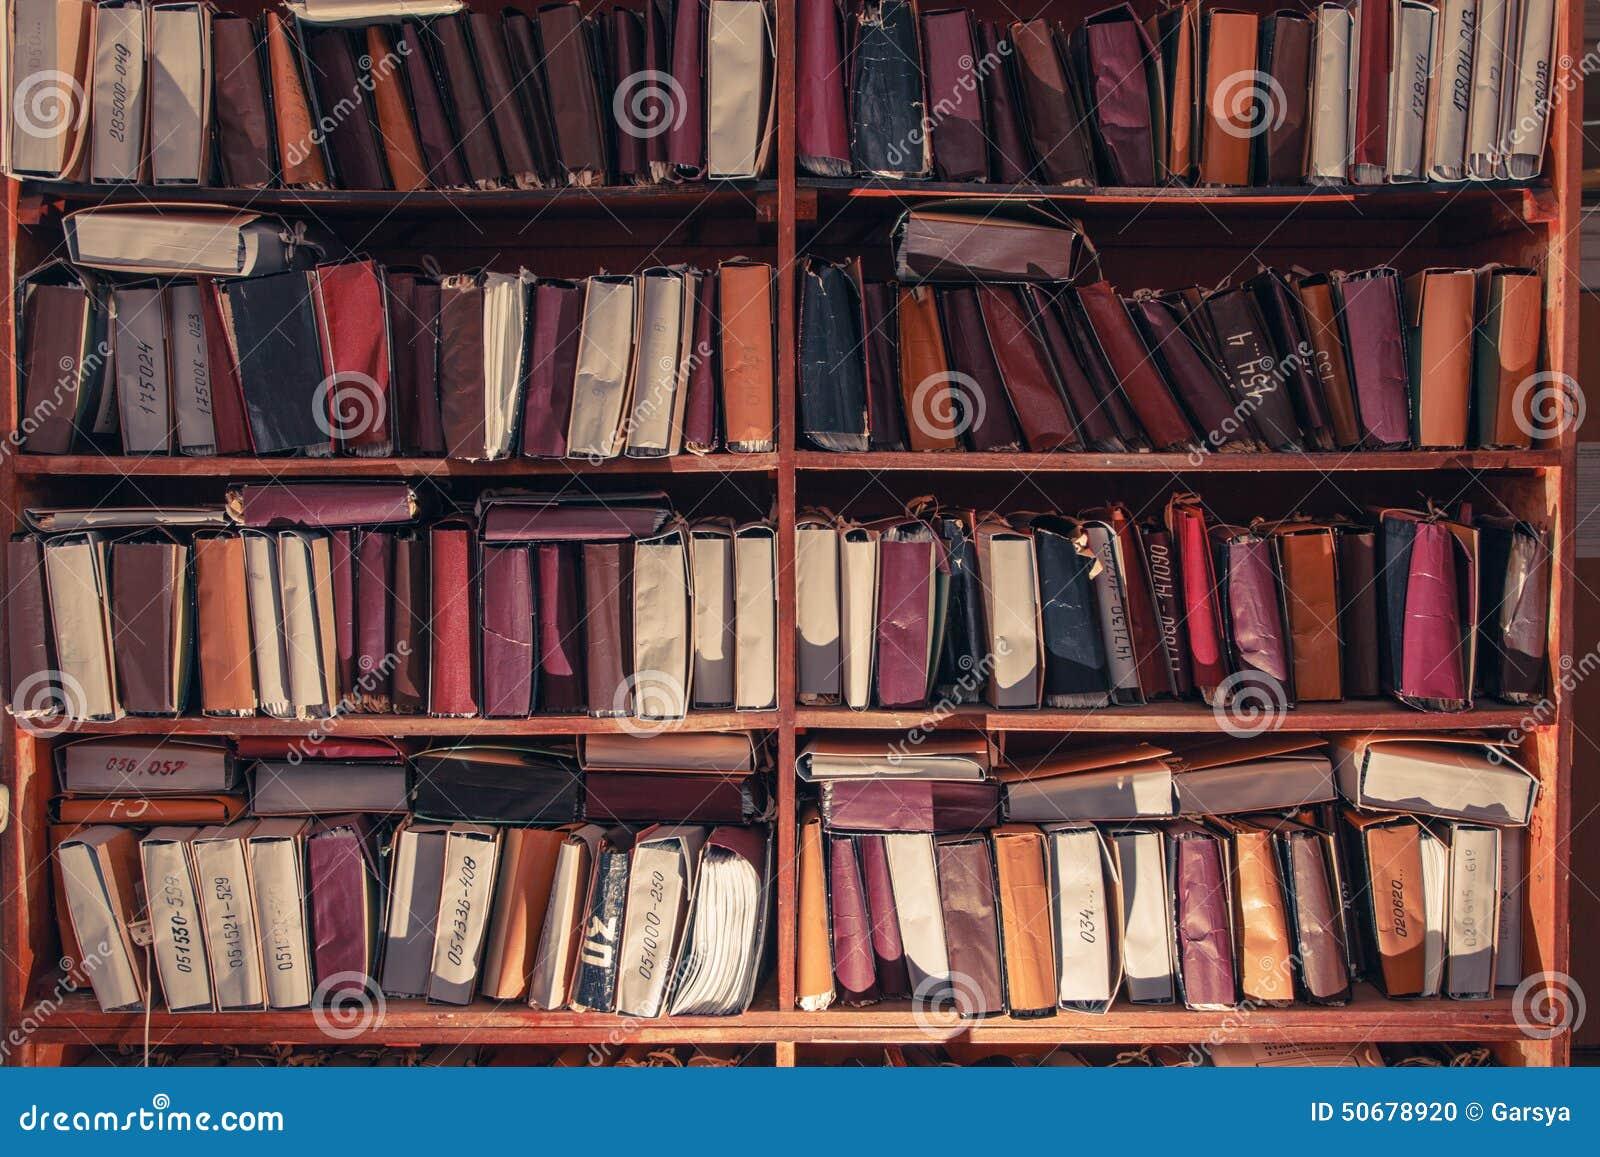 Download 在档案里堆积的纸张文件 库存照片. 图片 包括有 数据, 图书馆, 工作, 学习, 组织, 文件, 专门技术 - 50678920